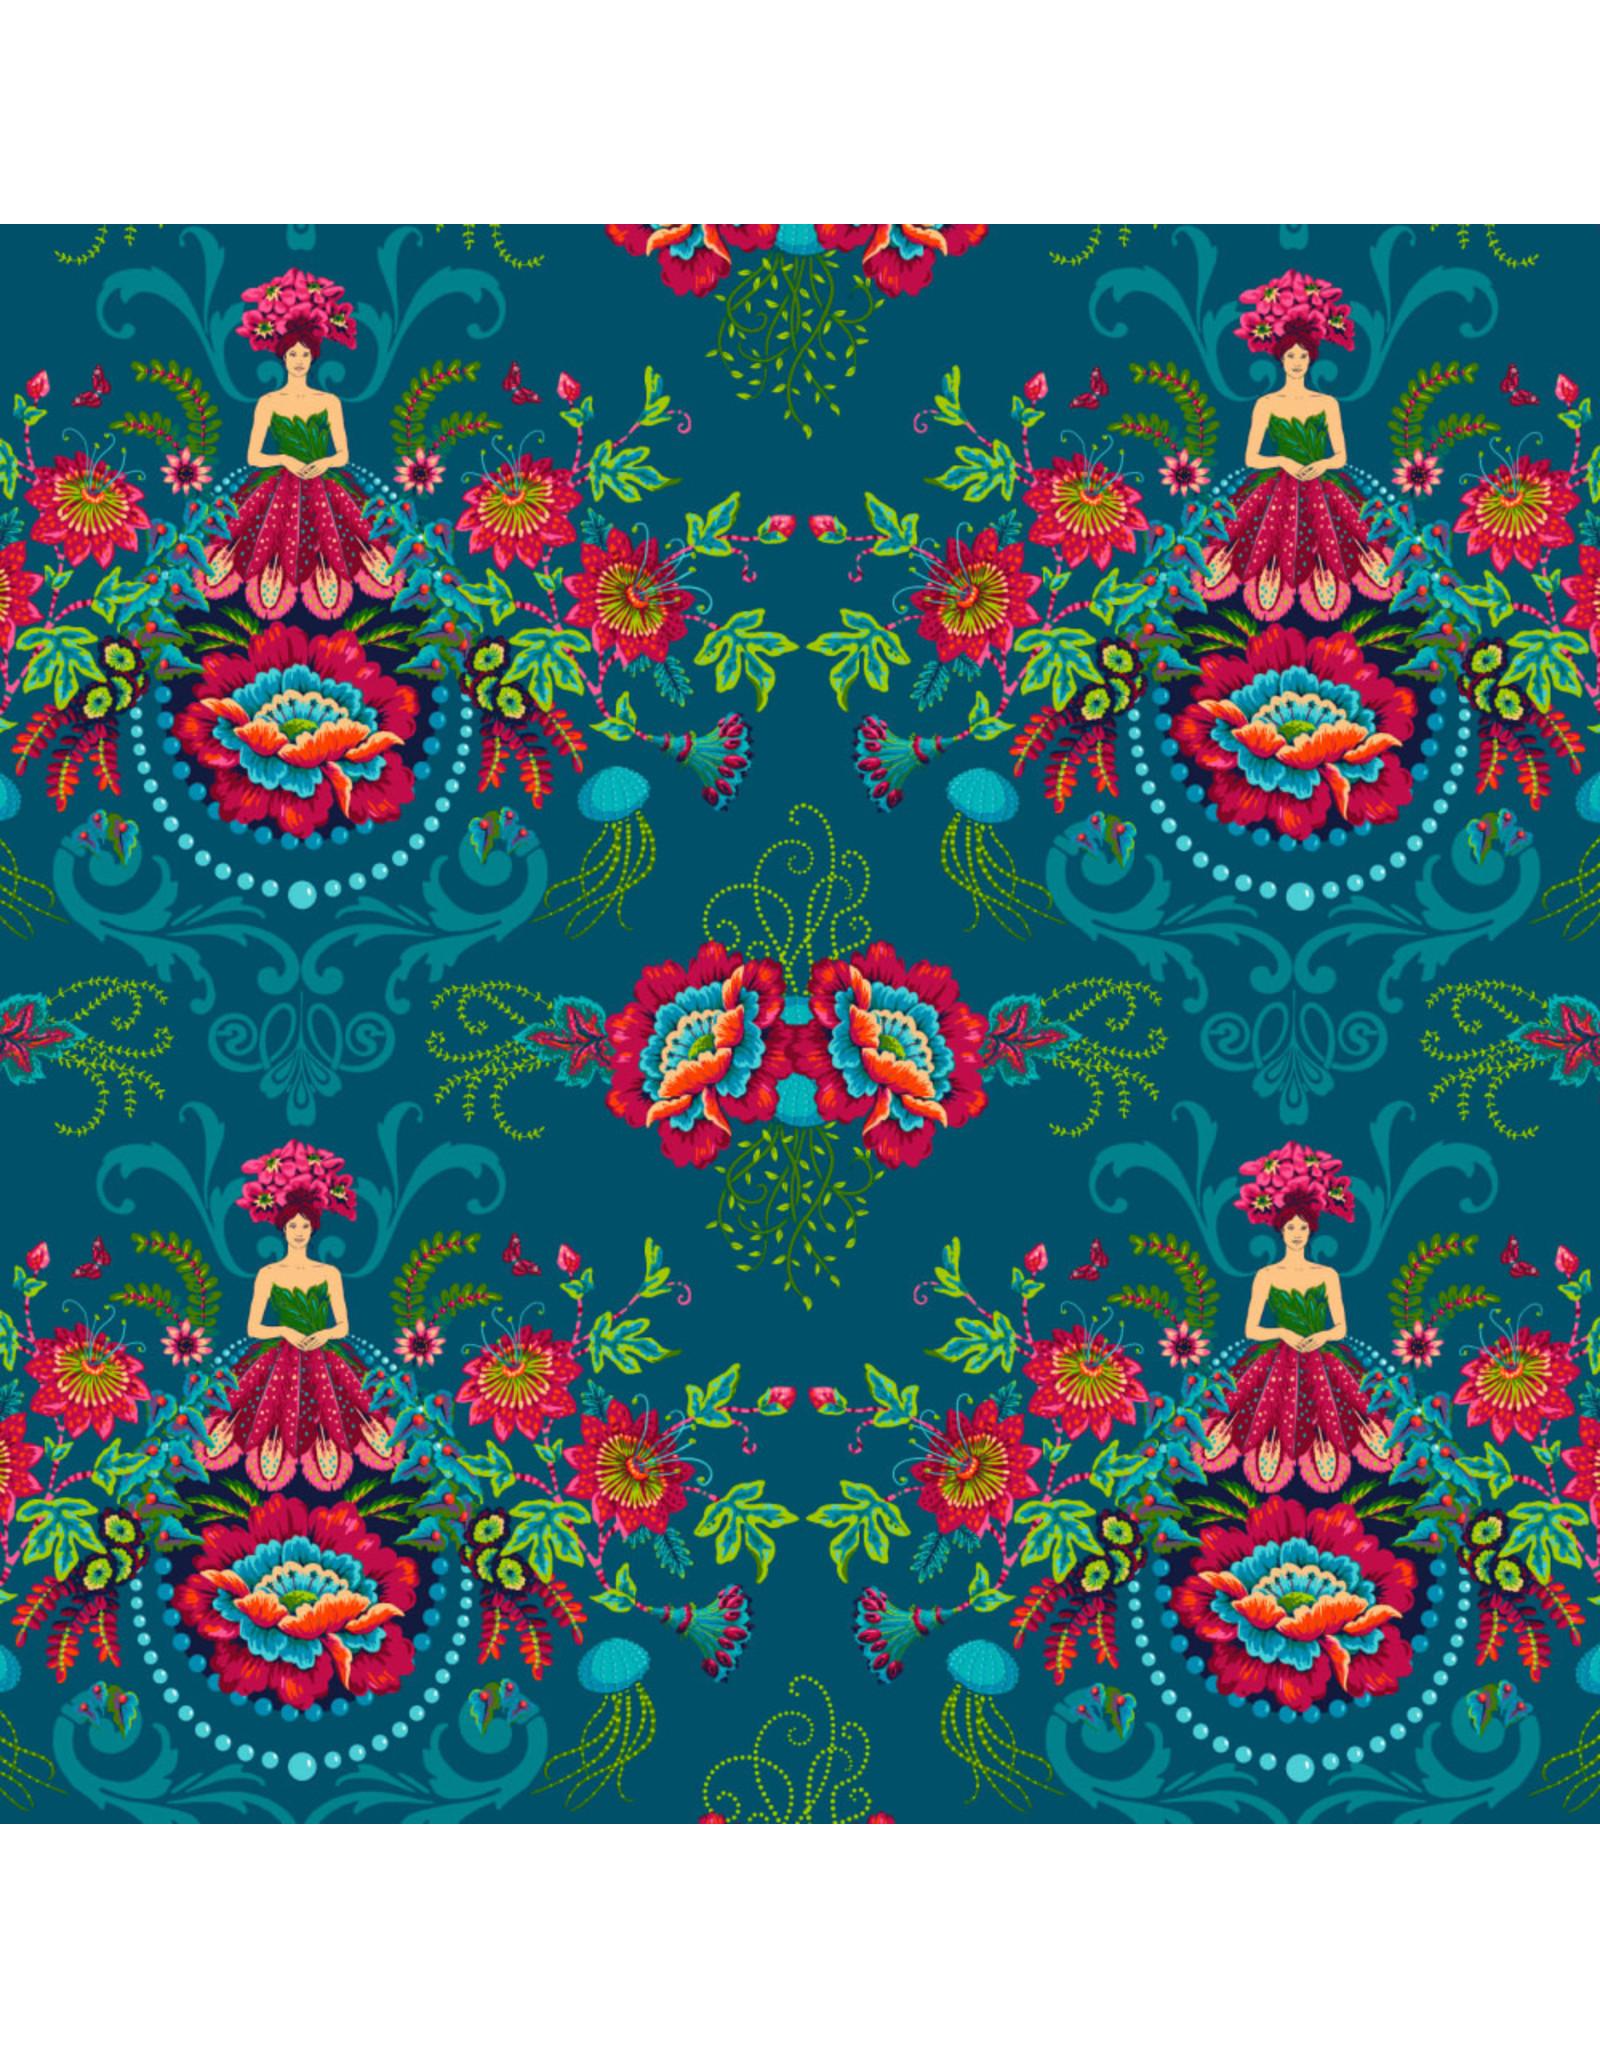 Odile Bailloeul MagiCountry, Mini Flower Fairies in Blue, Fabric Half-Yards